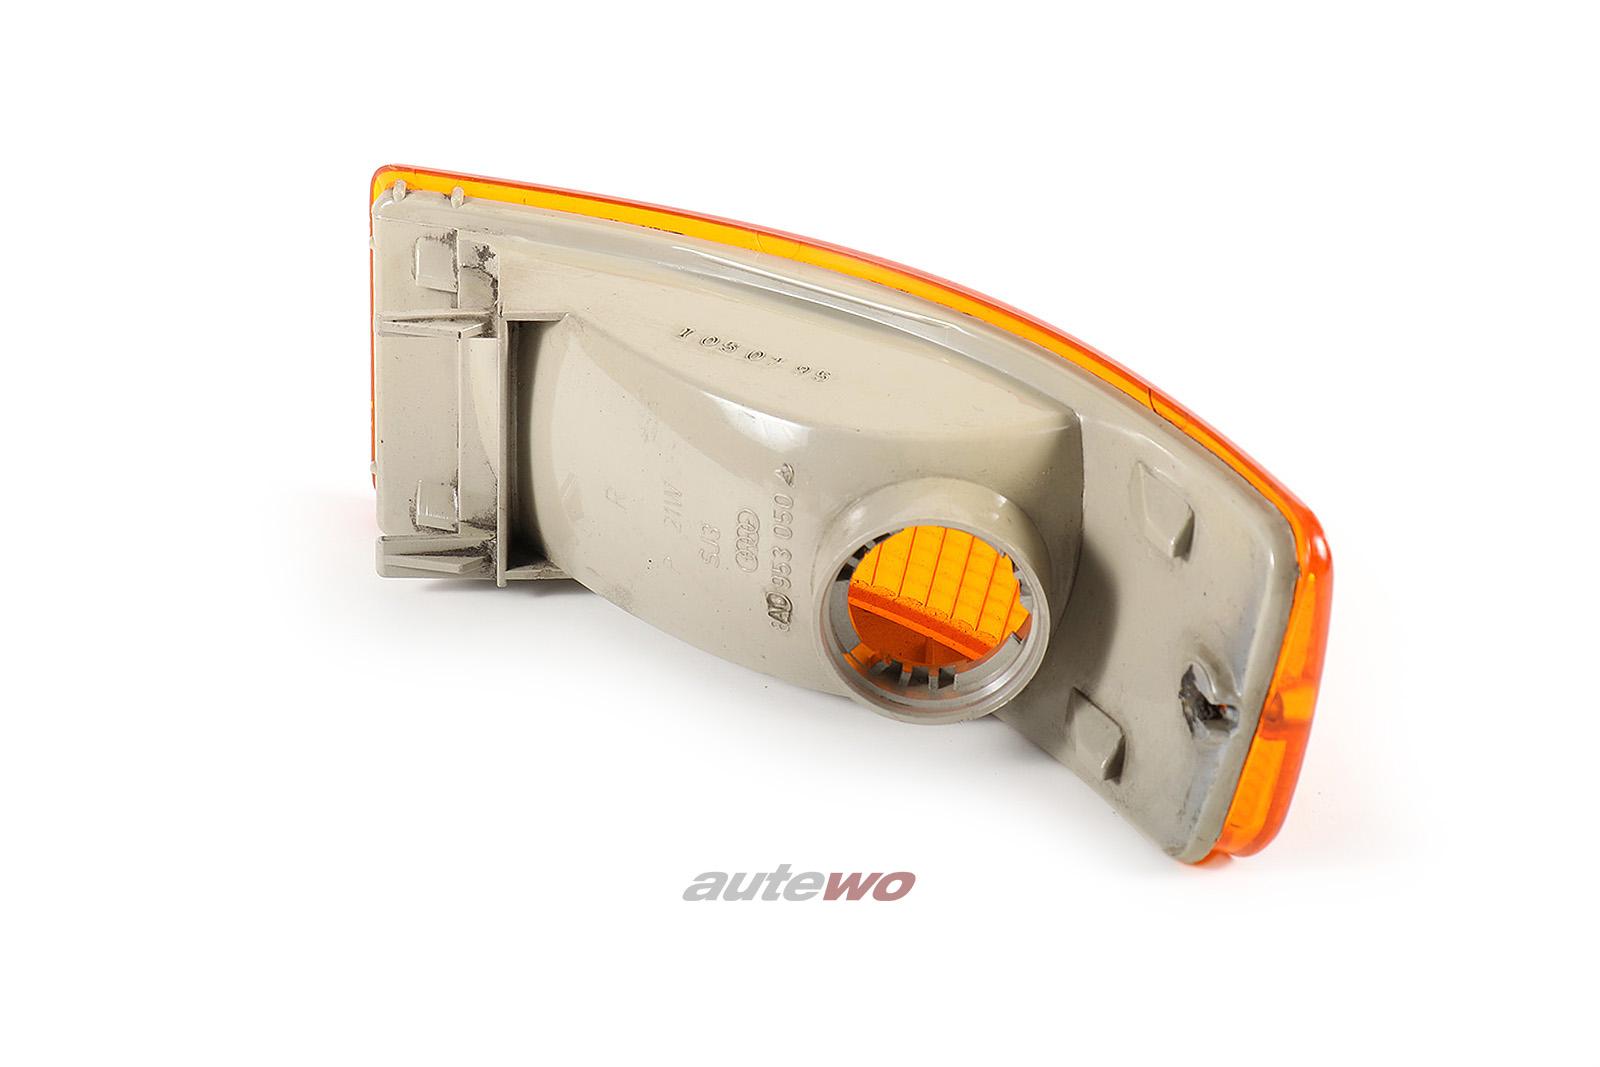 8A0953050A Audi 80 B4/Coupe/Cabrio Typ 89/S2 Blinker Vorne Rechts orange